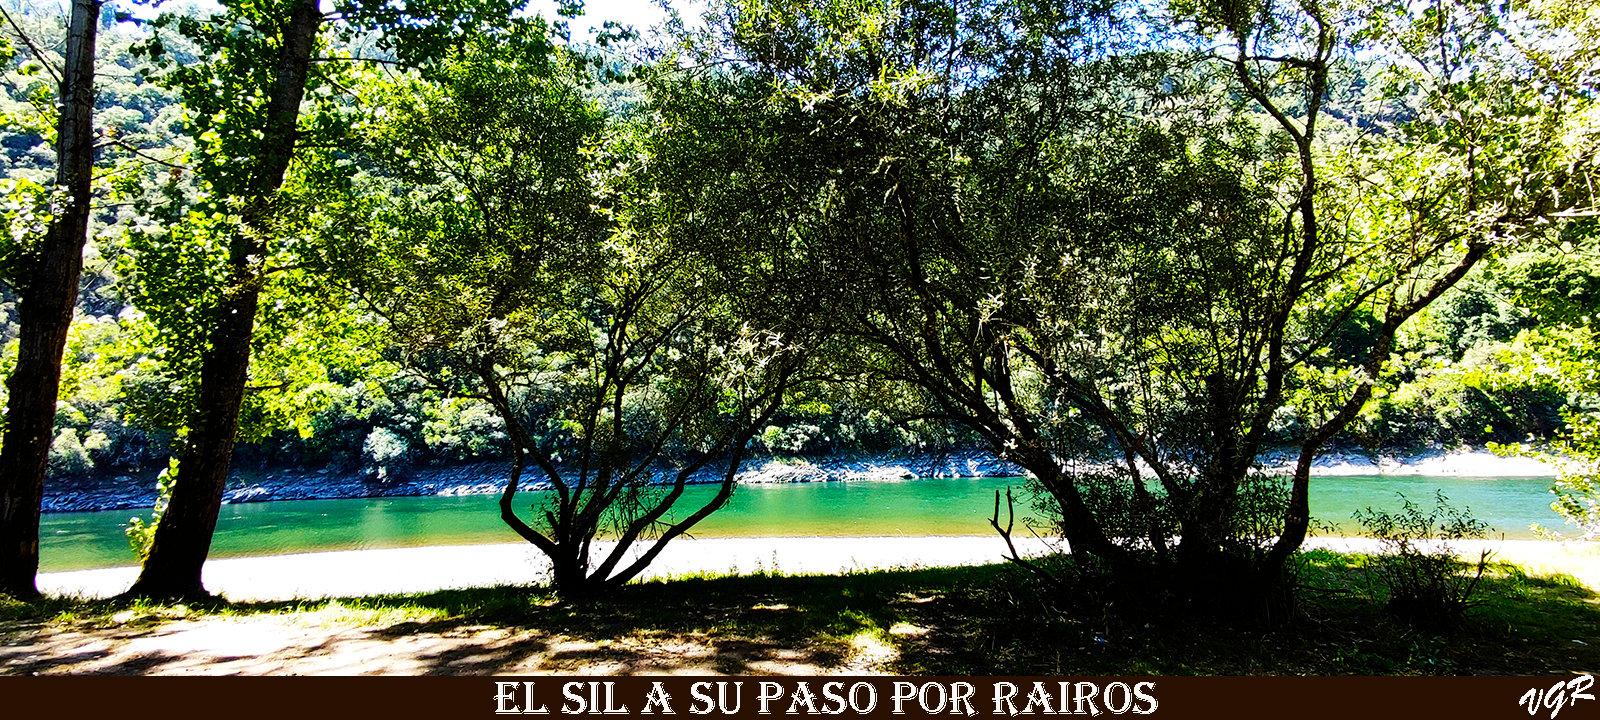 Rairos-El Sil-1-WEB.jpg